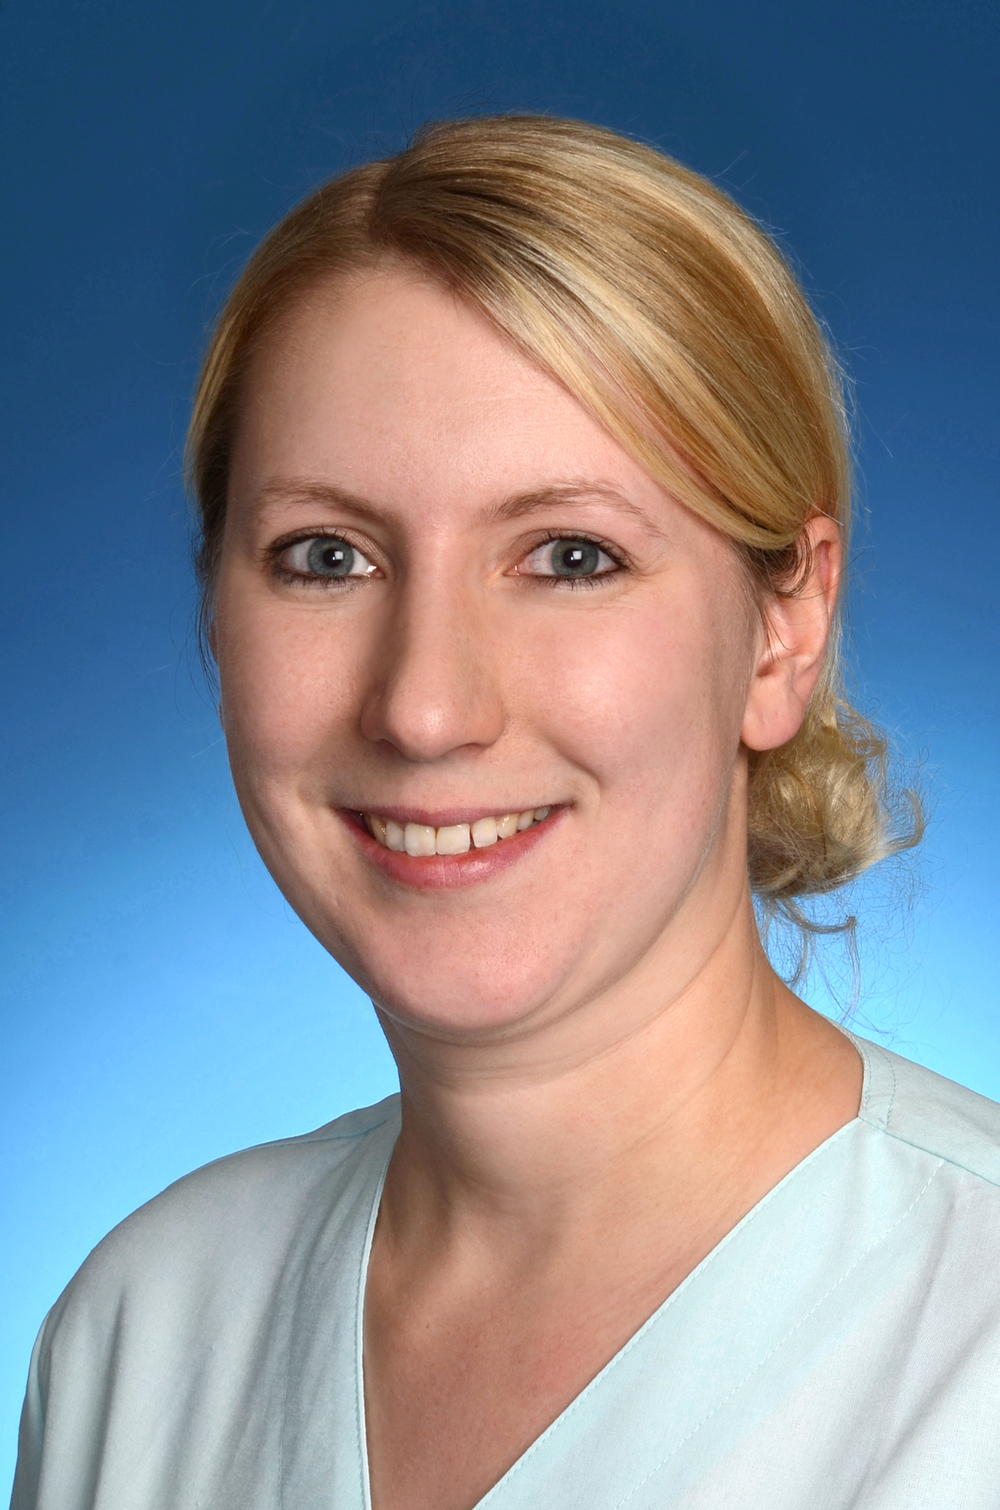 Mrs Melanie Steinmetz